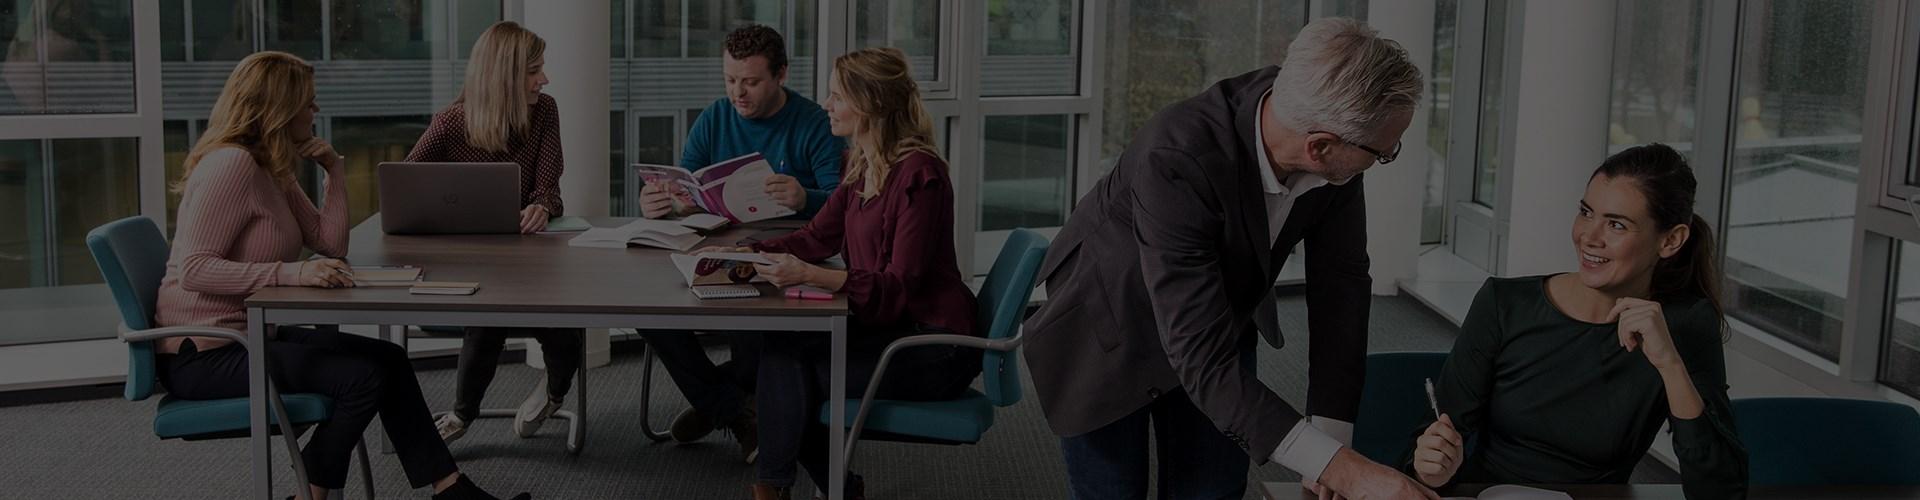 https://image.opleidingsgroep.nl/static/media/opleiding/opleiding/teasers/brand/scheidegger/desktop.jpg?ext=.jpg